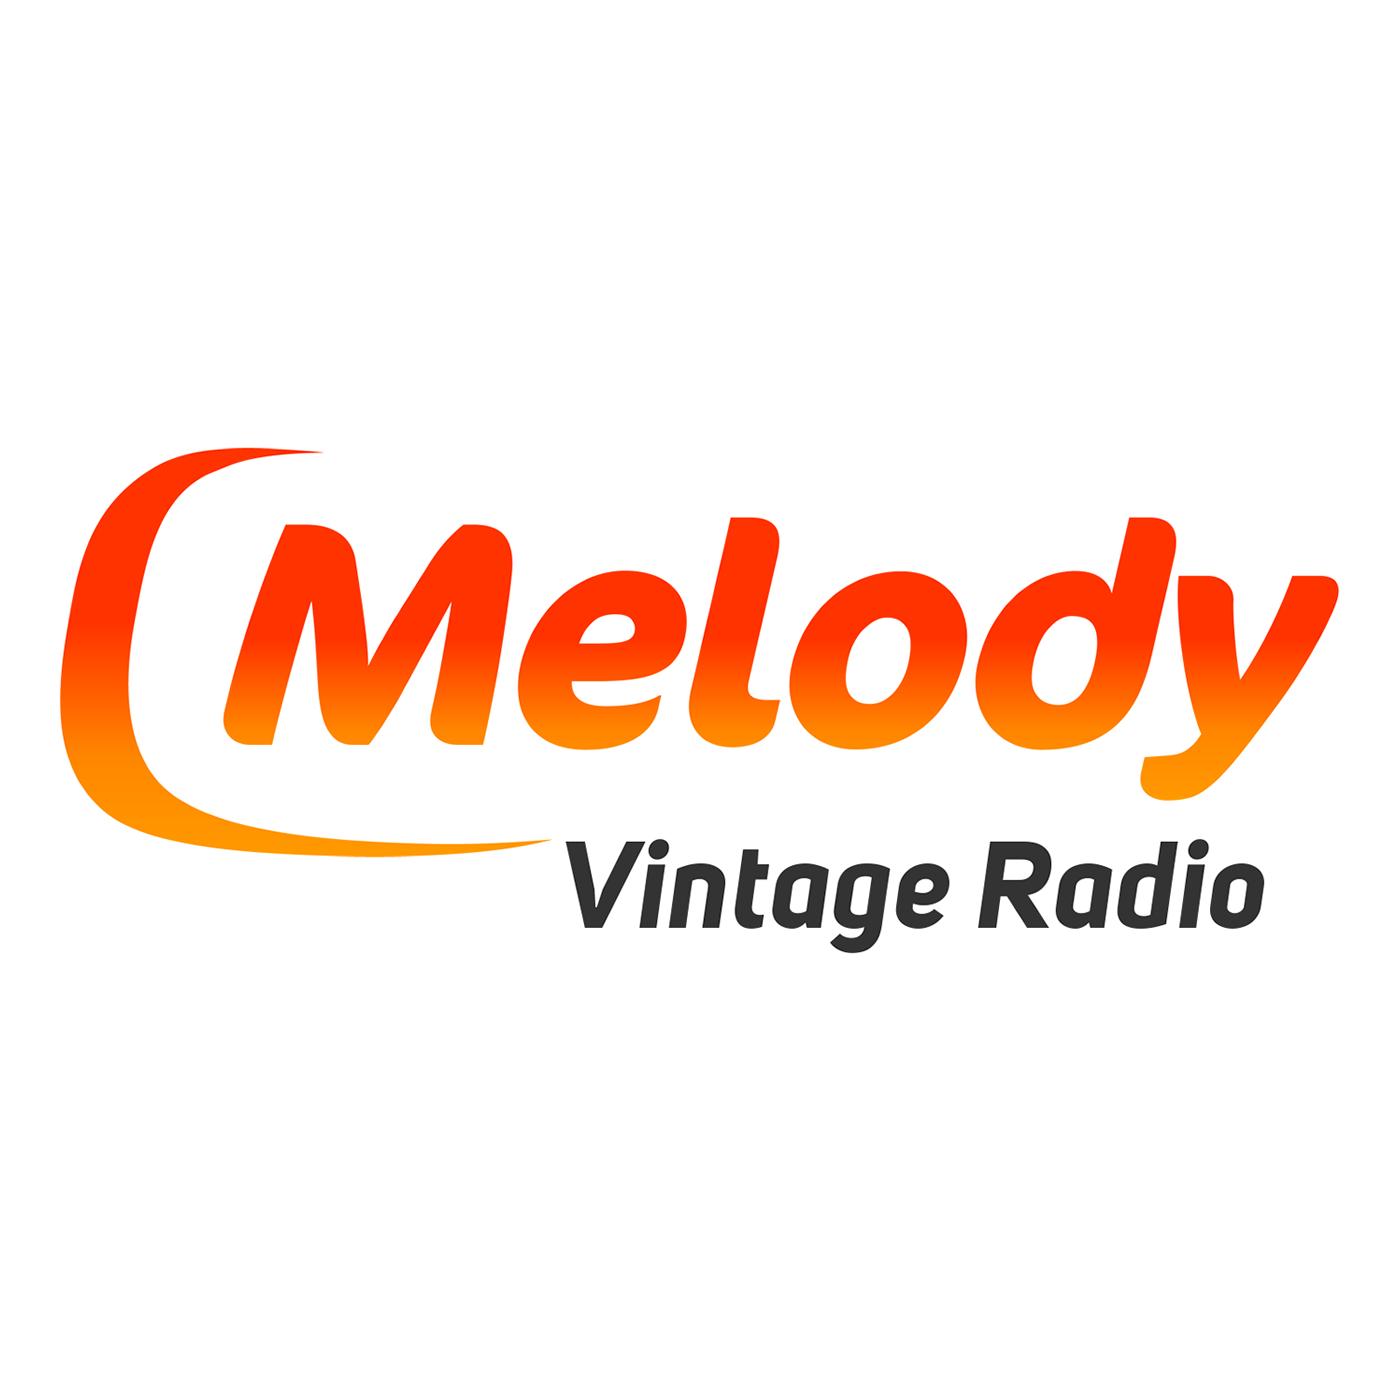 MELODY - VINTAGE RADIO